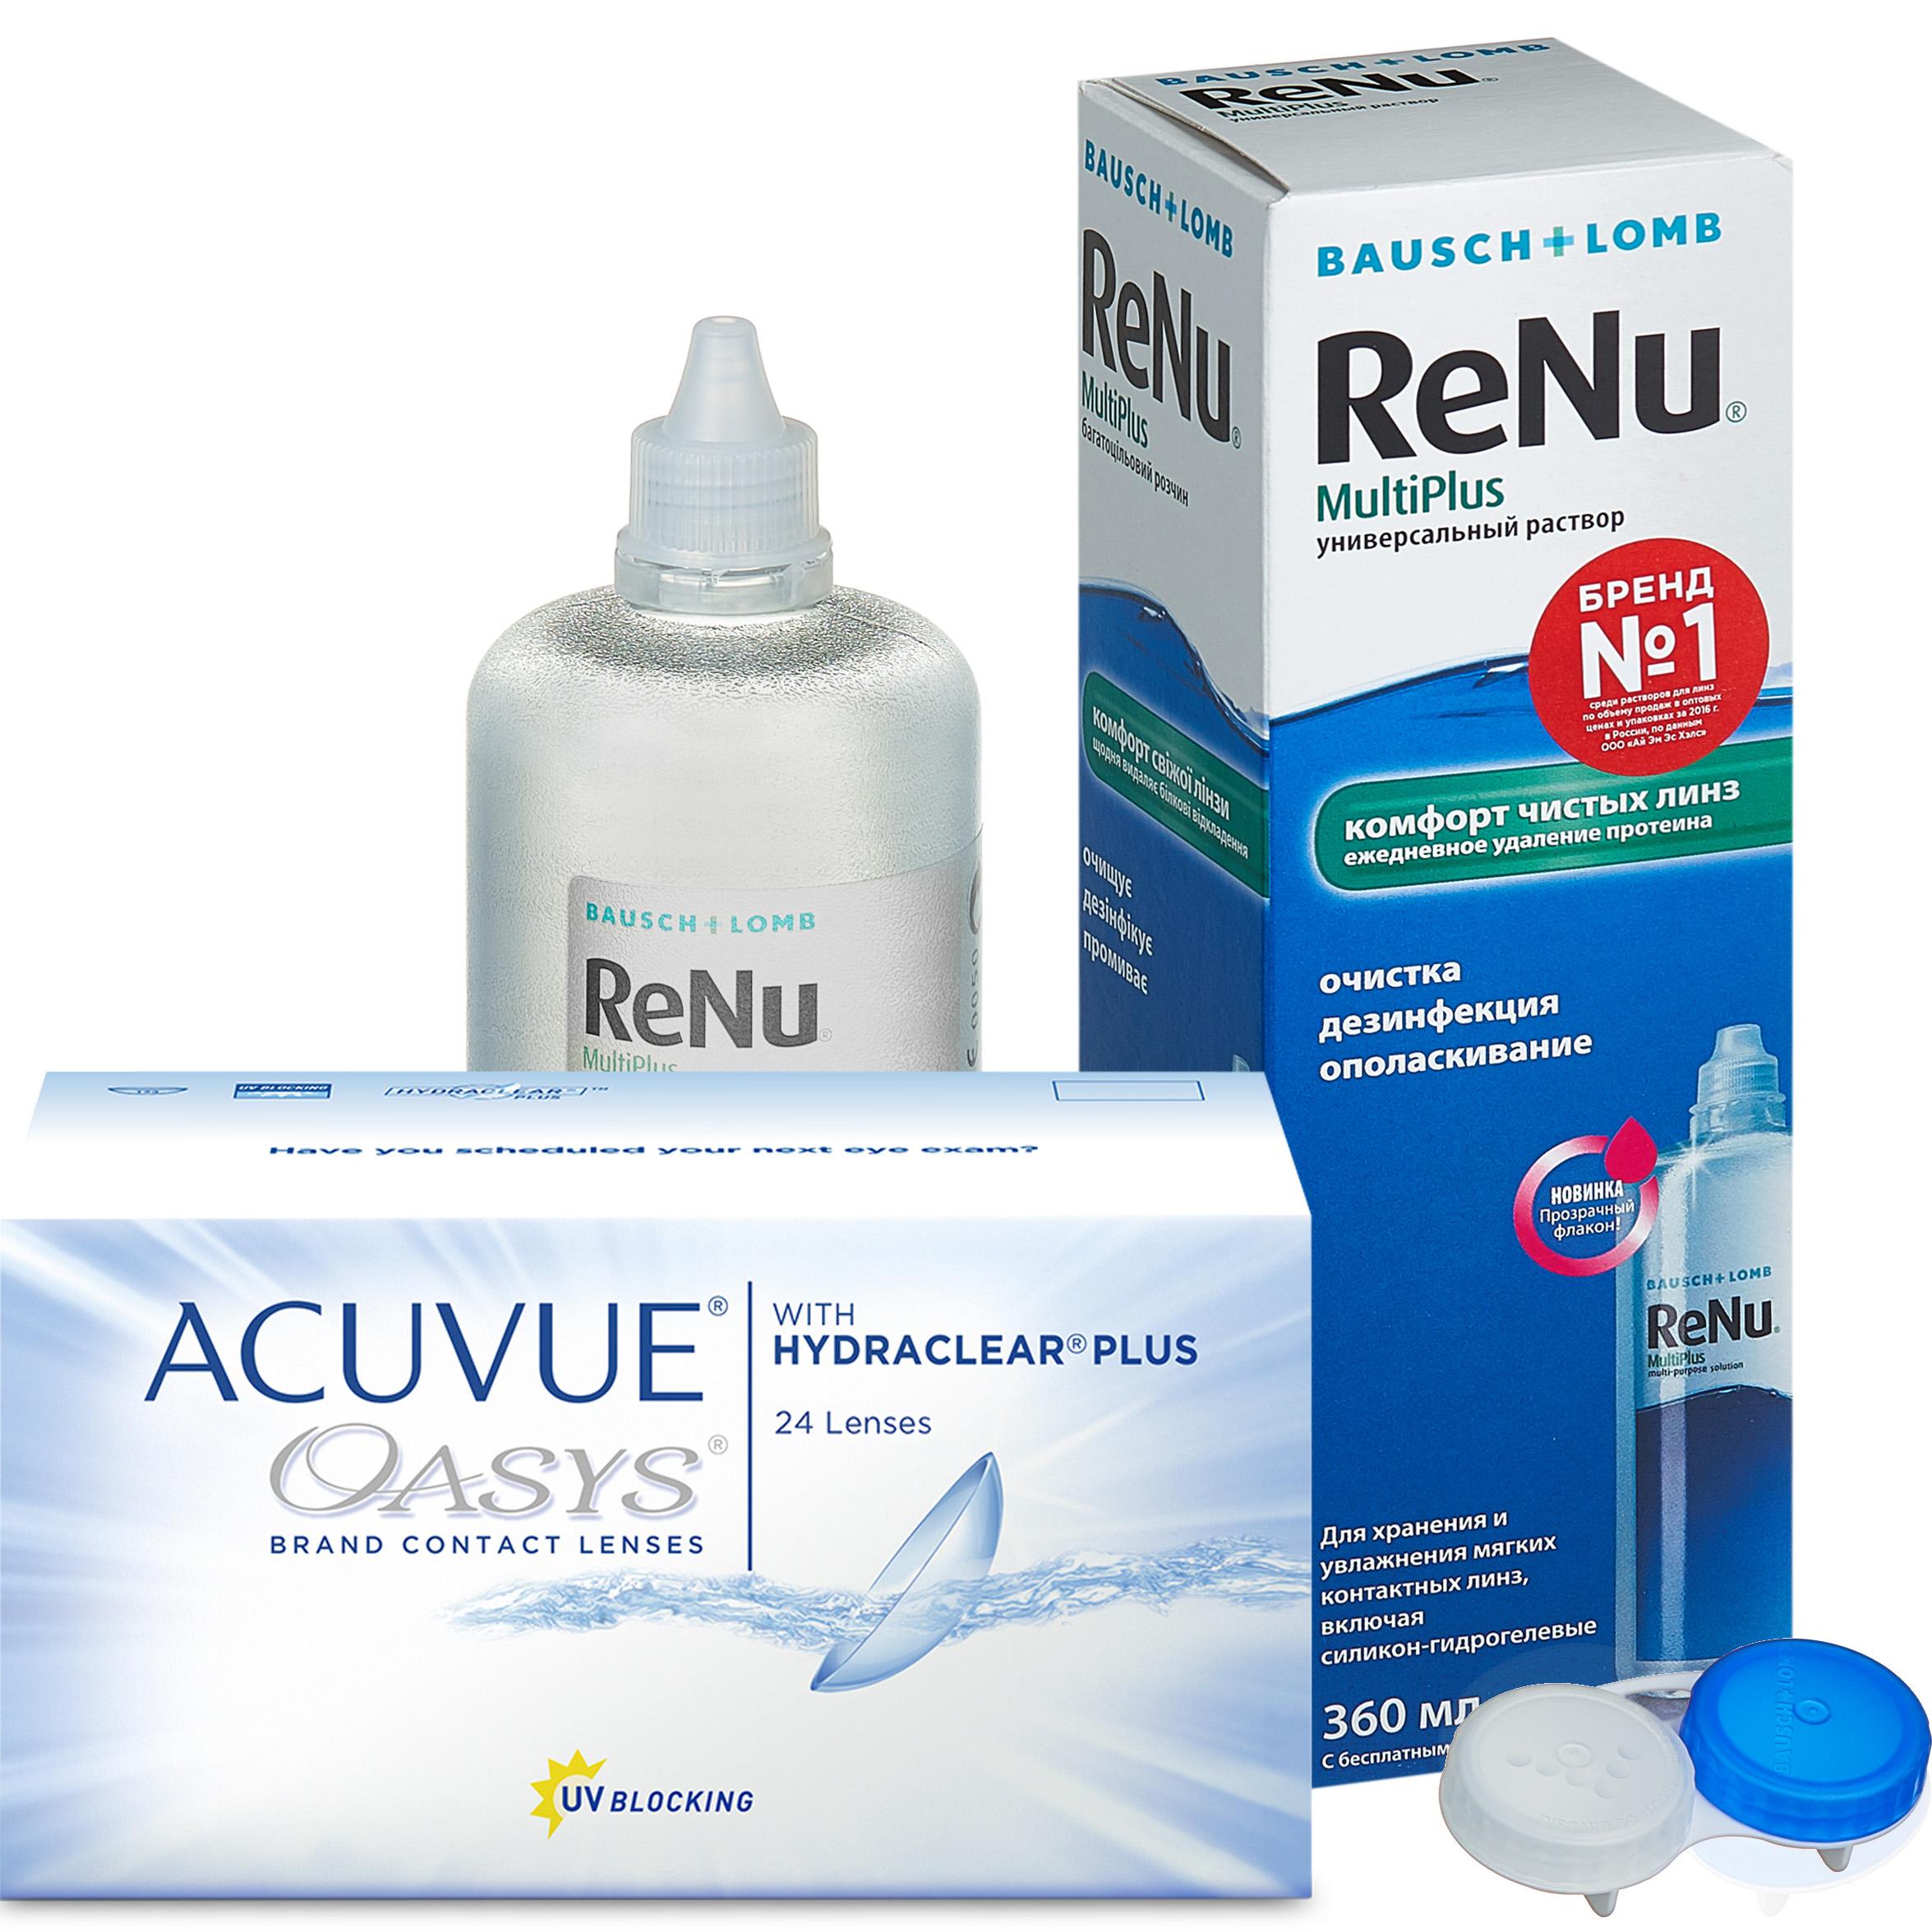 Купить Oasys with Hydraclear Plus 24 линзы + ReNu MultiPlus, Линзы Acuvue Oasys with Hydraclear Plus 24 линзы R 8.4 -8, 50 + ReNu Multi Plus 360 мл